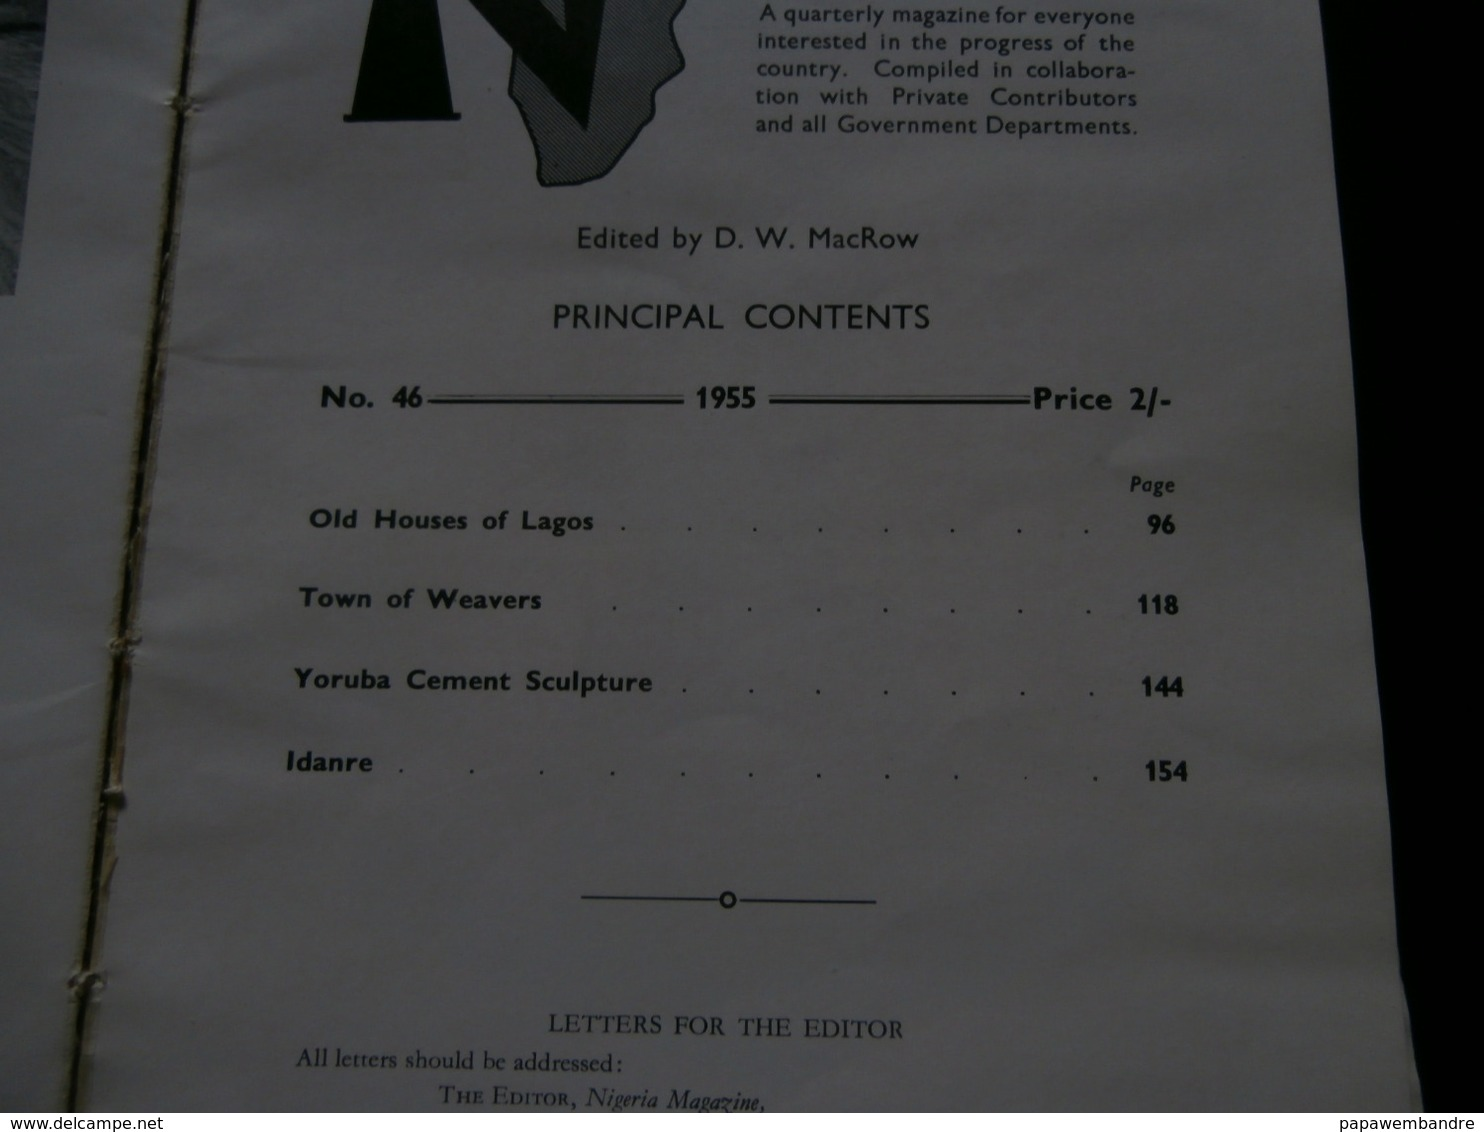 Nigeria 46 (1955) Lagos, Yoruba, Iseyin, Idanre, Ulli Beier, C B Dodwell, Murray - Geschiedenis